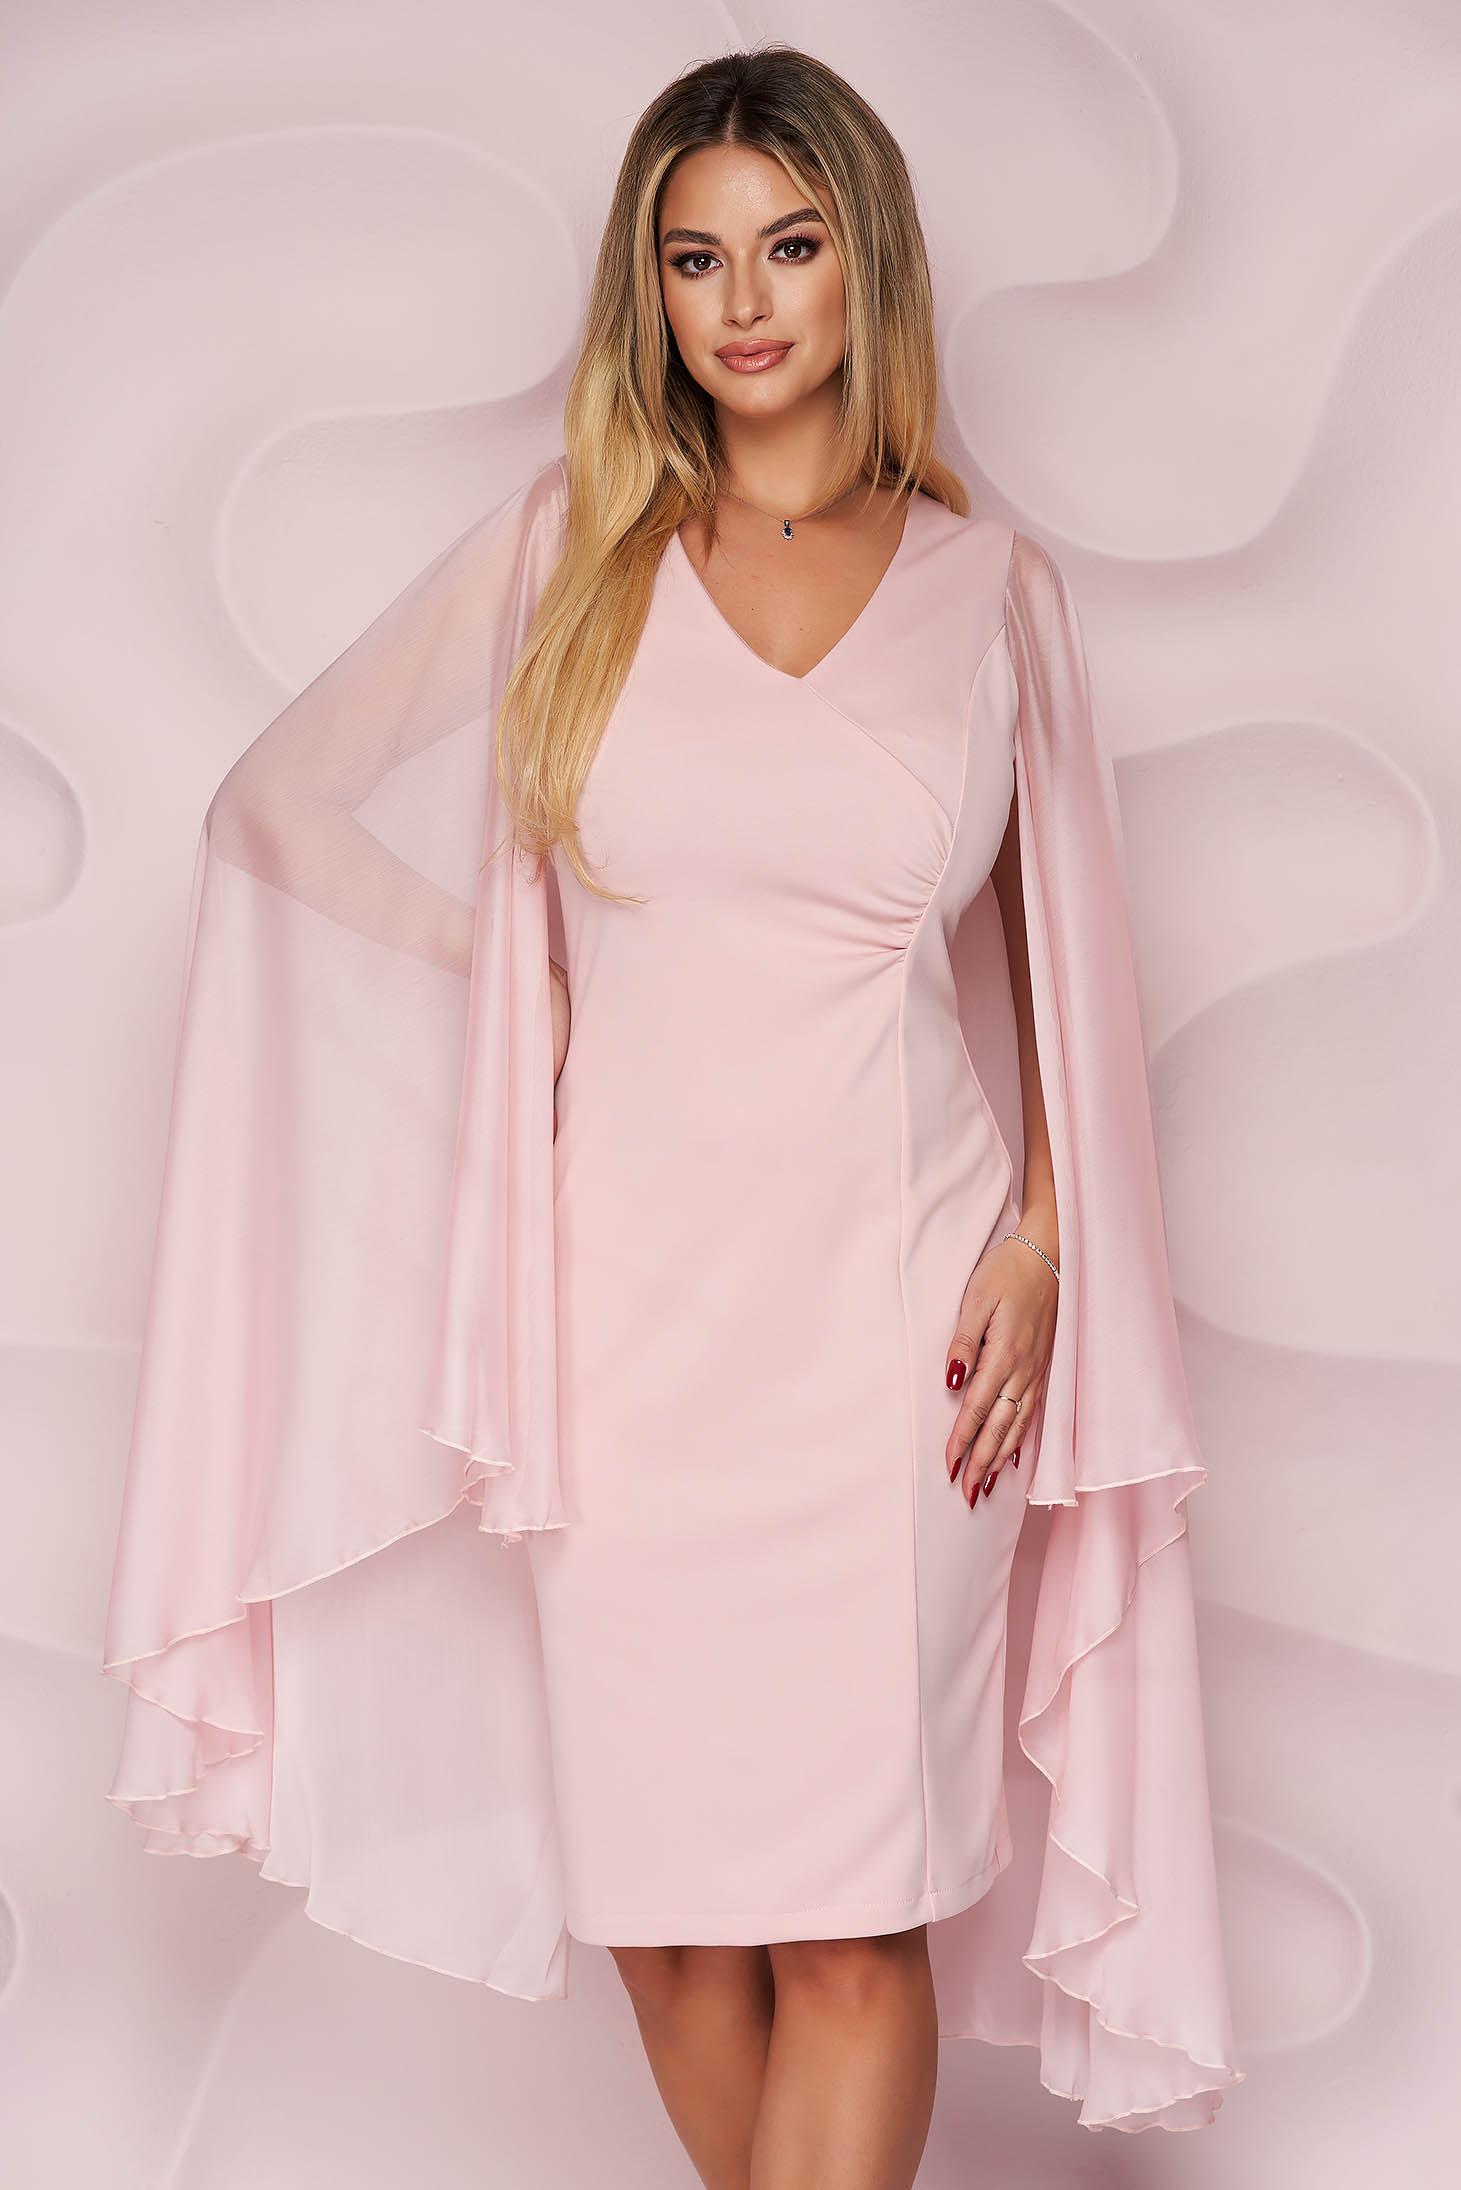 Rochie Artista roz scurta tip creion din stofa elastica si suprapunere de voal